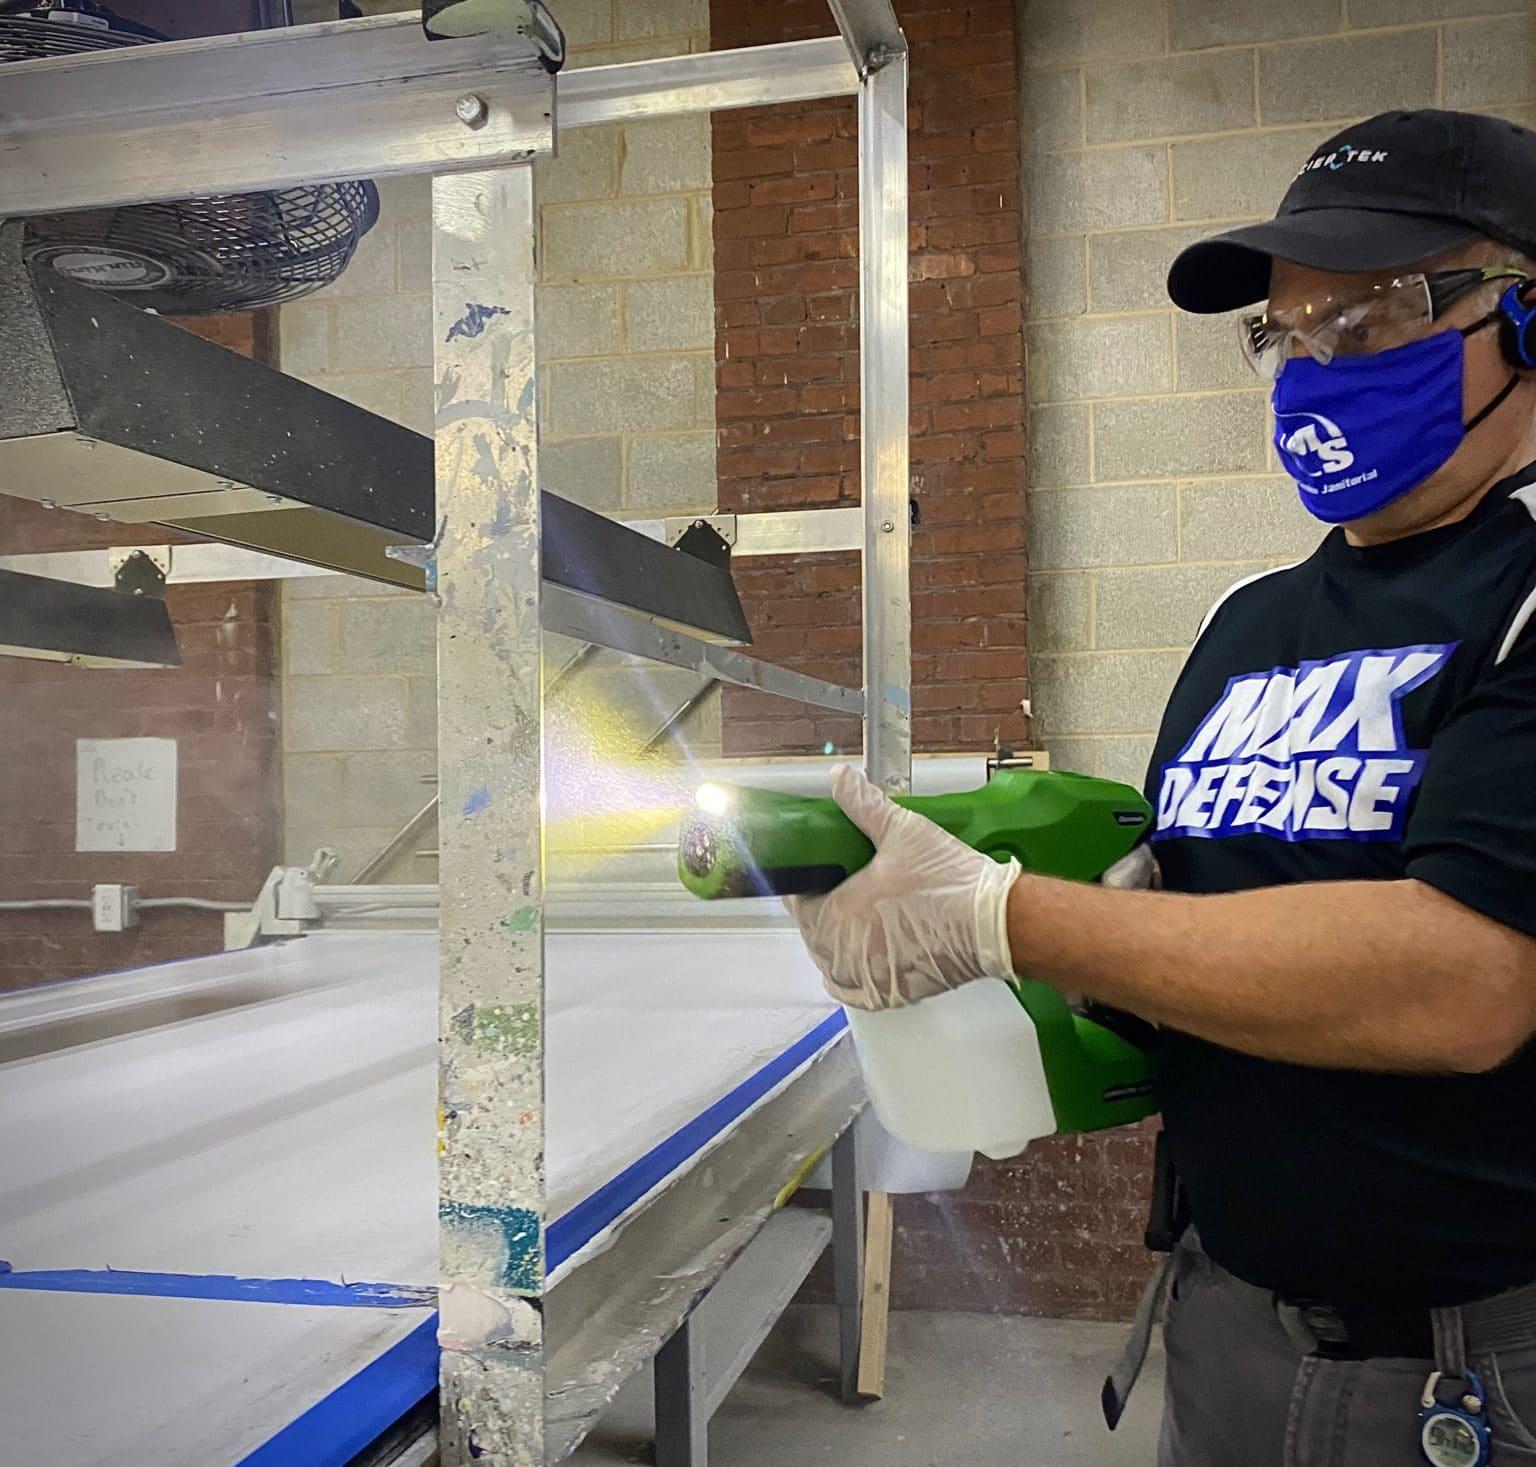 Electrostatic sprayer in action